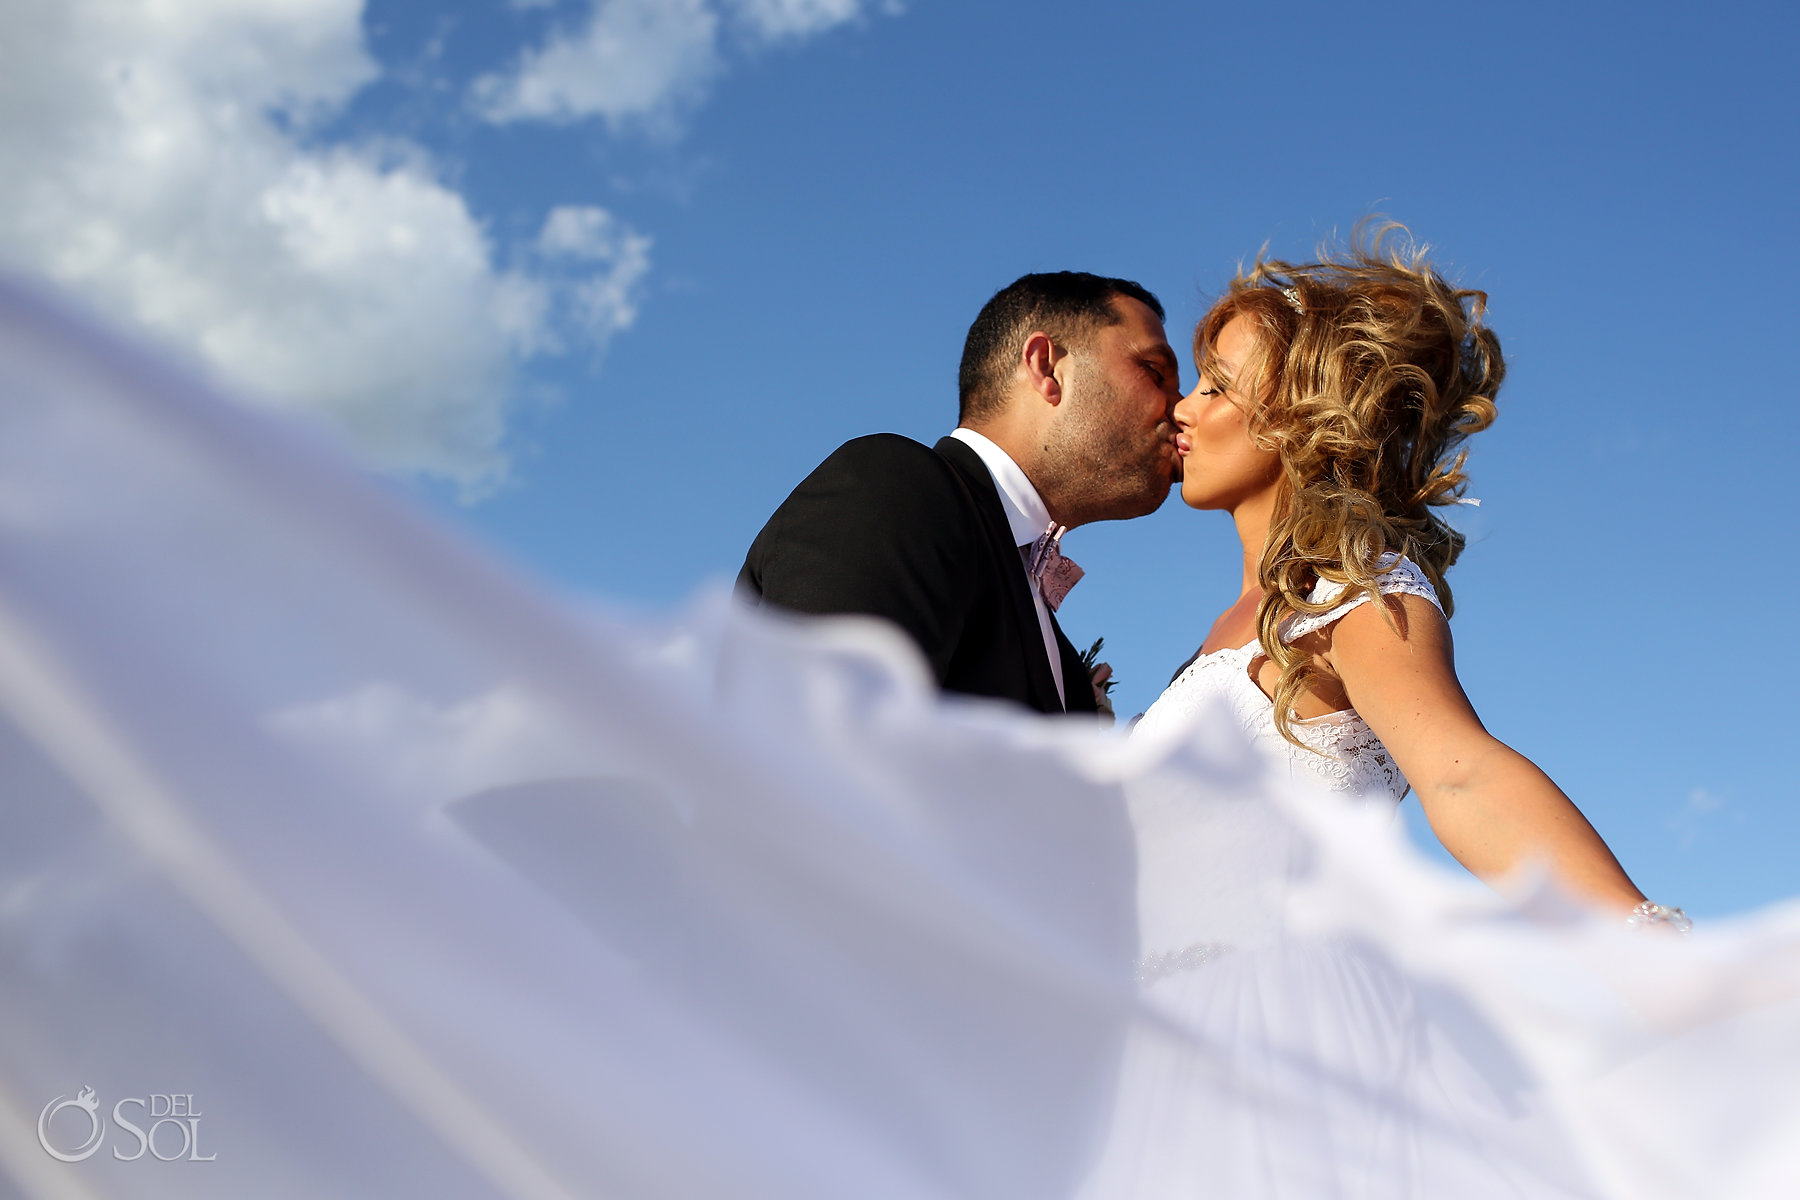 groom and bride passionate kiss portrait Blue sky